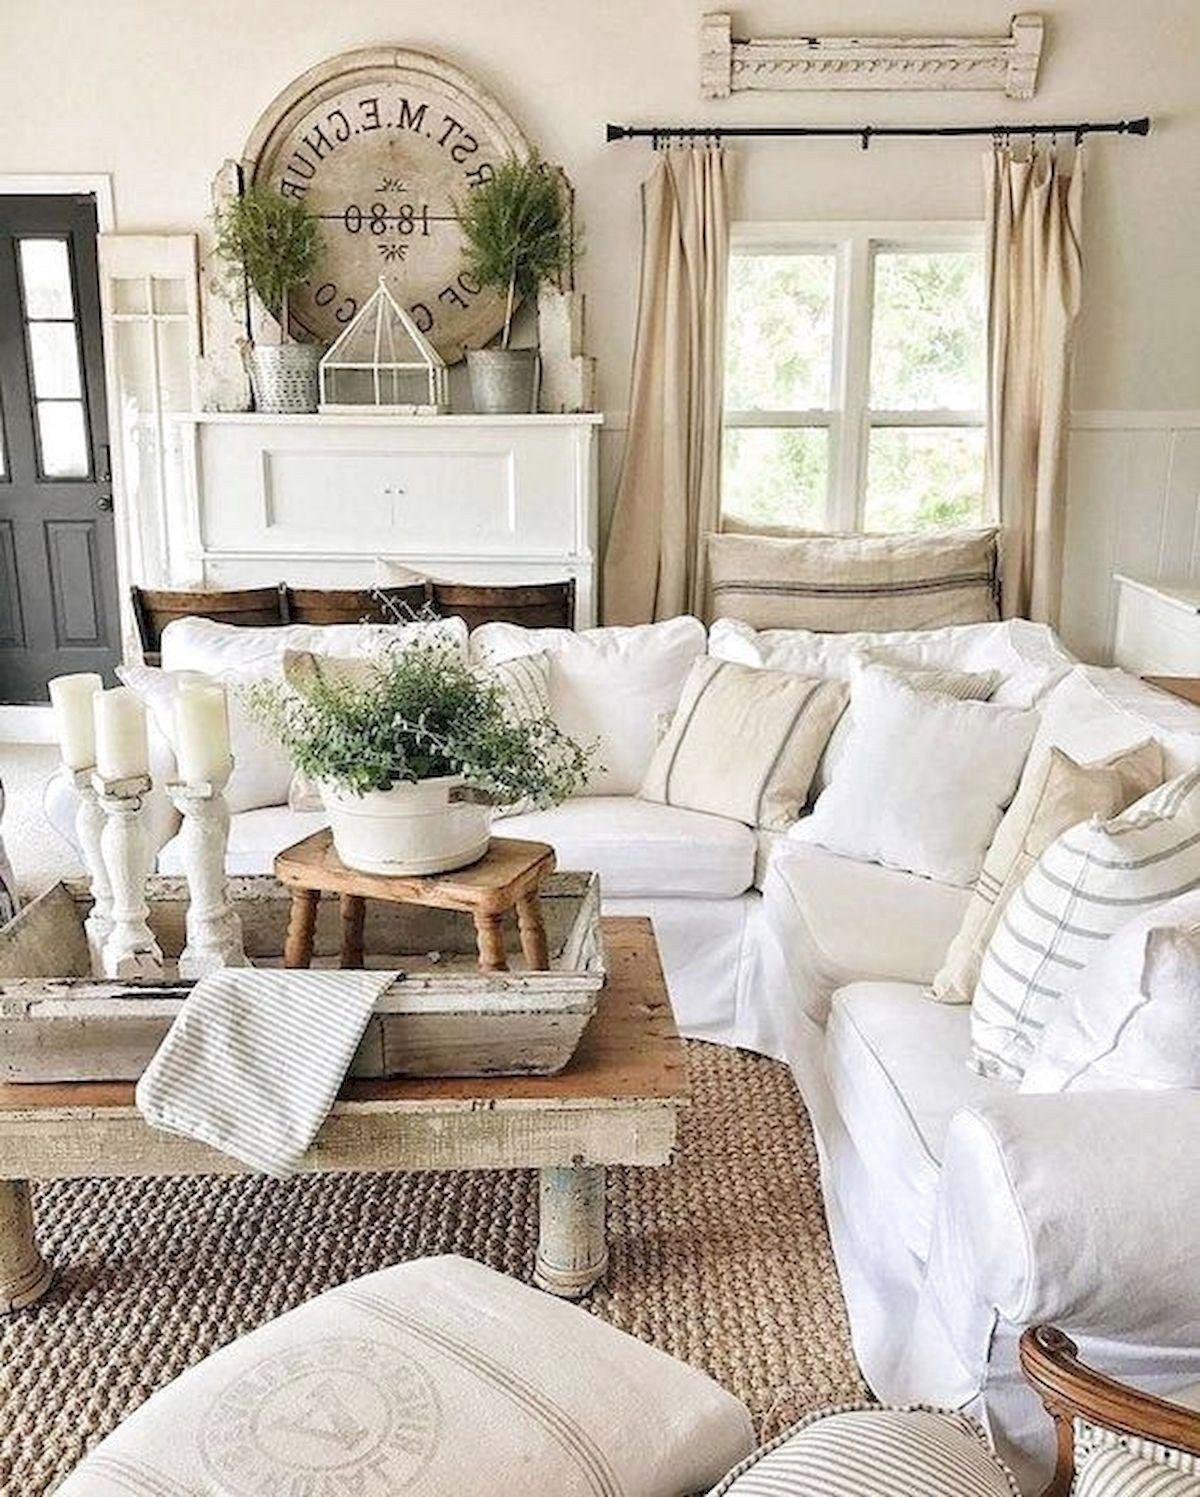 Living Room Curtain Ideas To Perfect Living Room Interior: 100 Best Farmhouse Living Room Decor Ideas